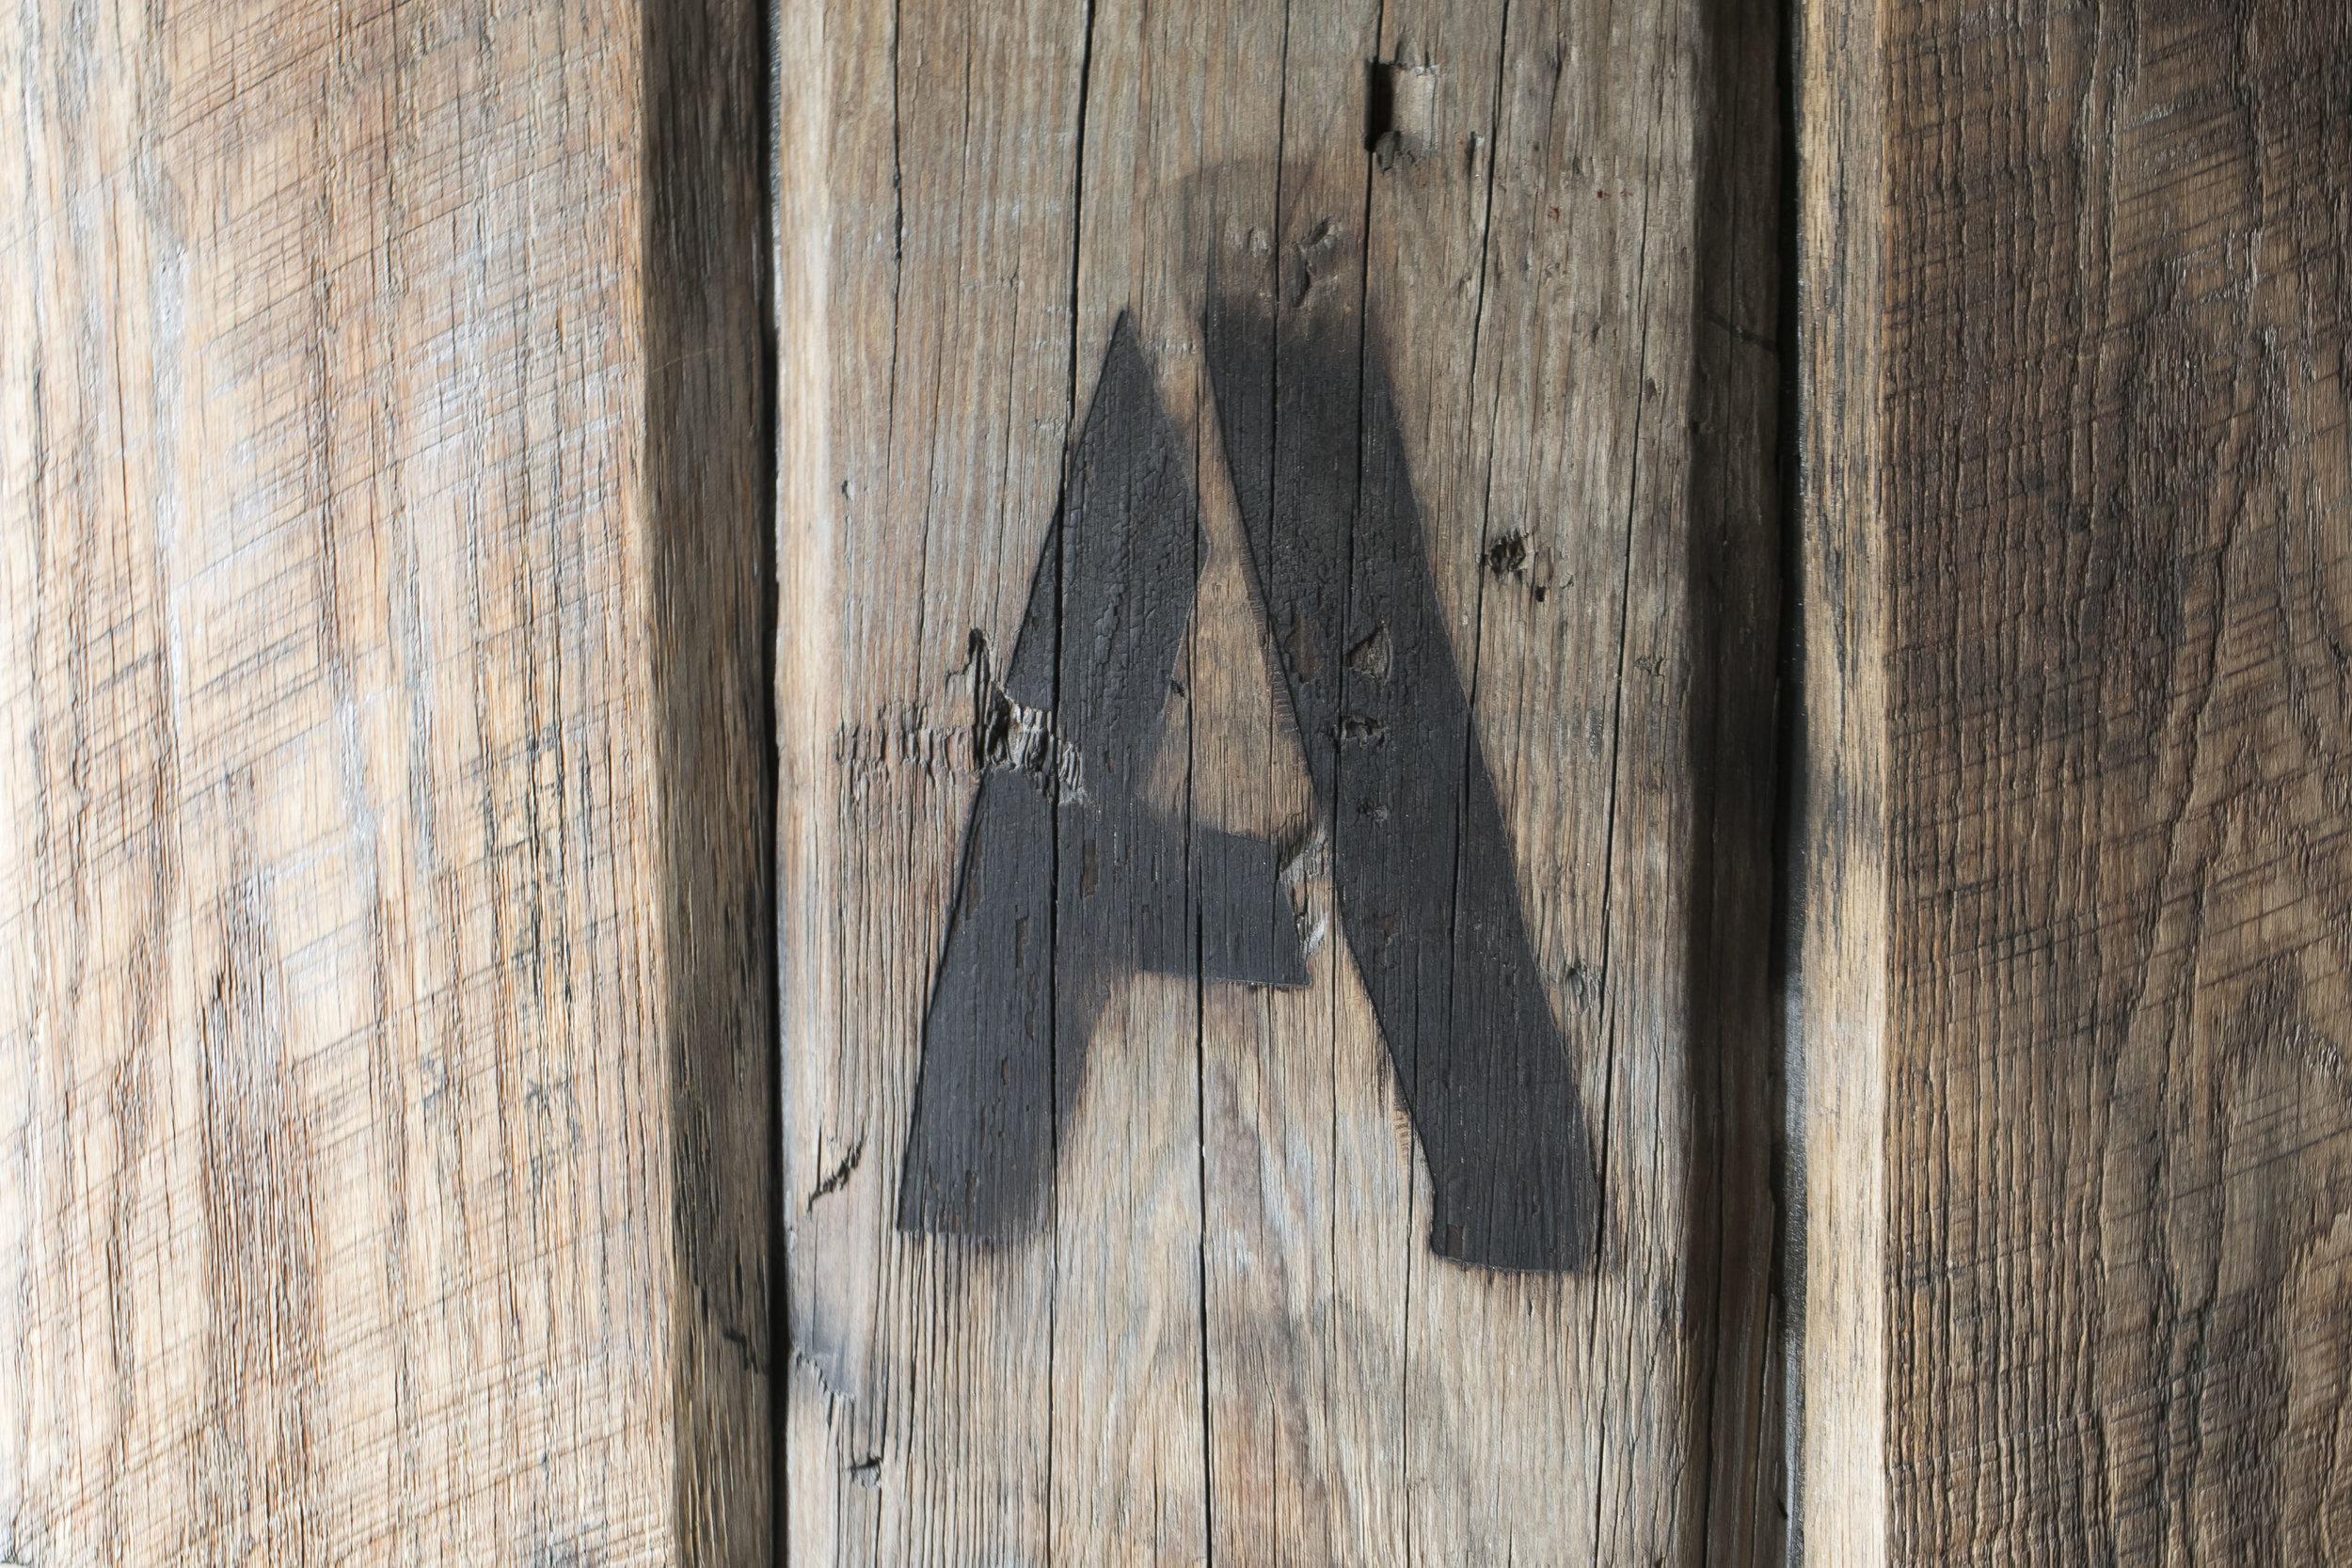 A-BAR_BROOKLYN-PHOTO 7.JPG